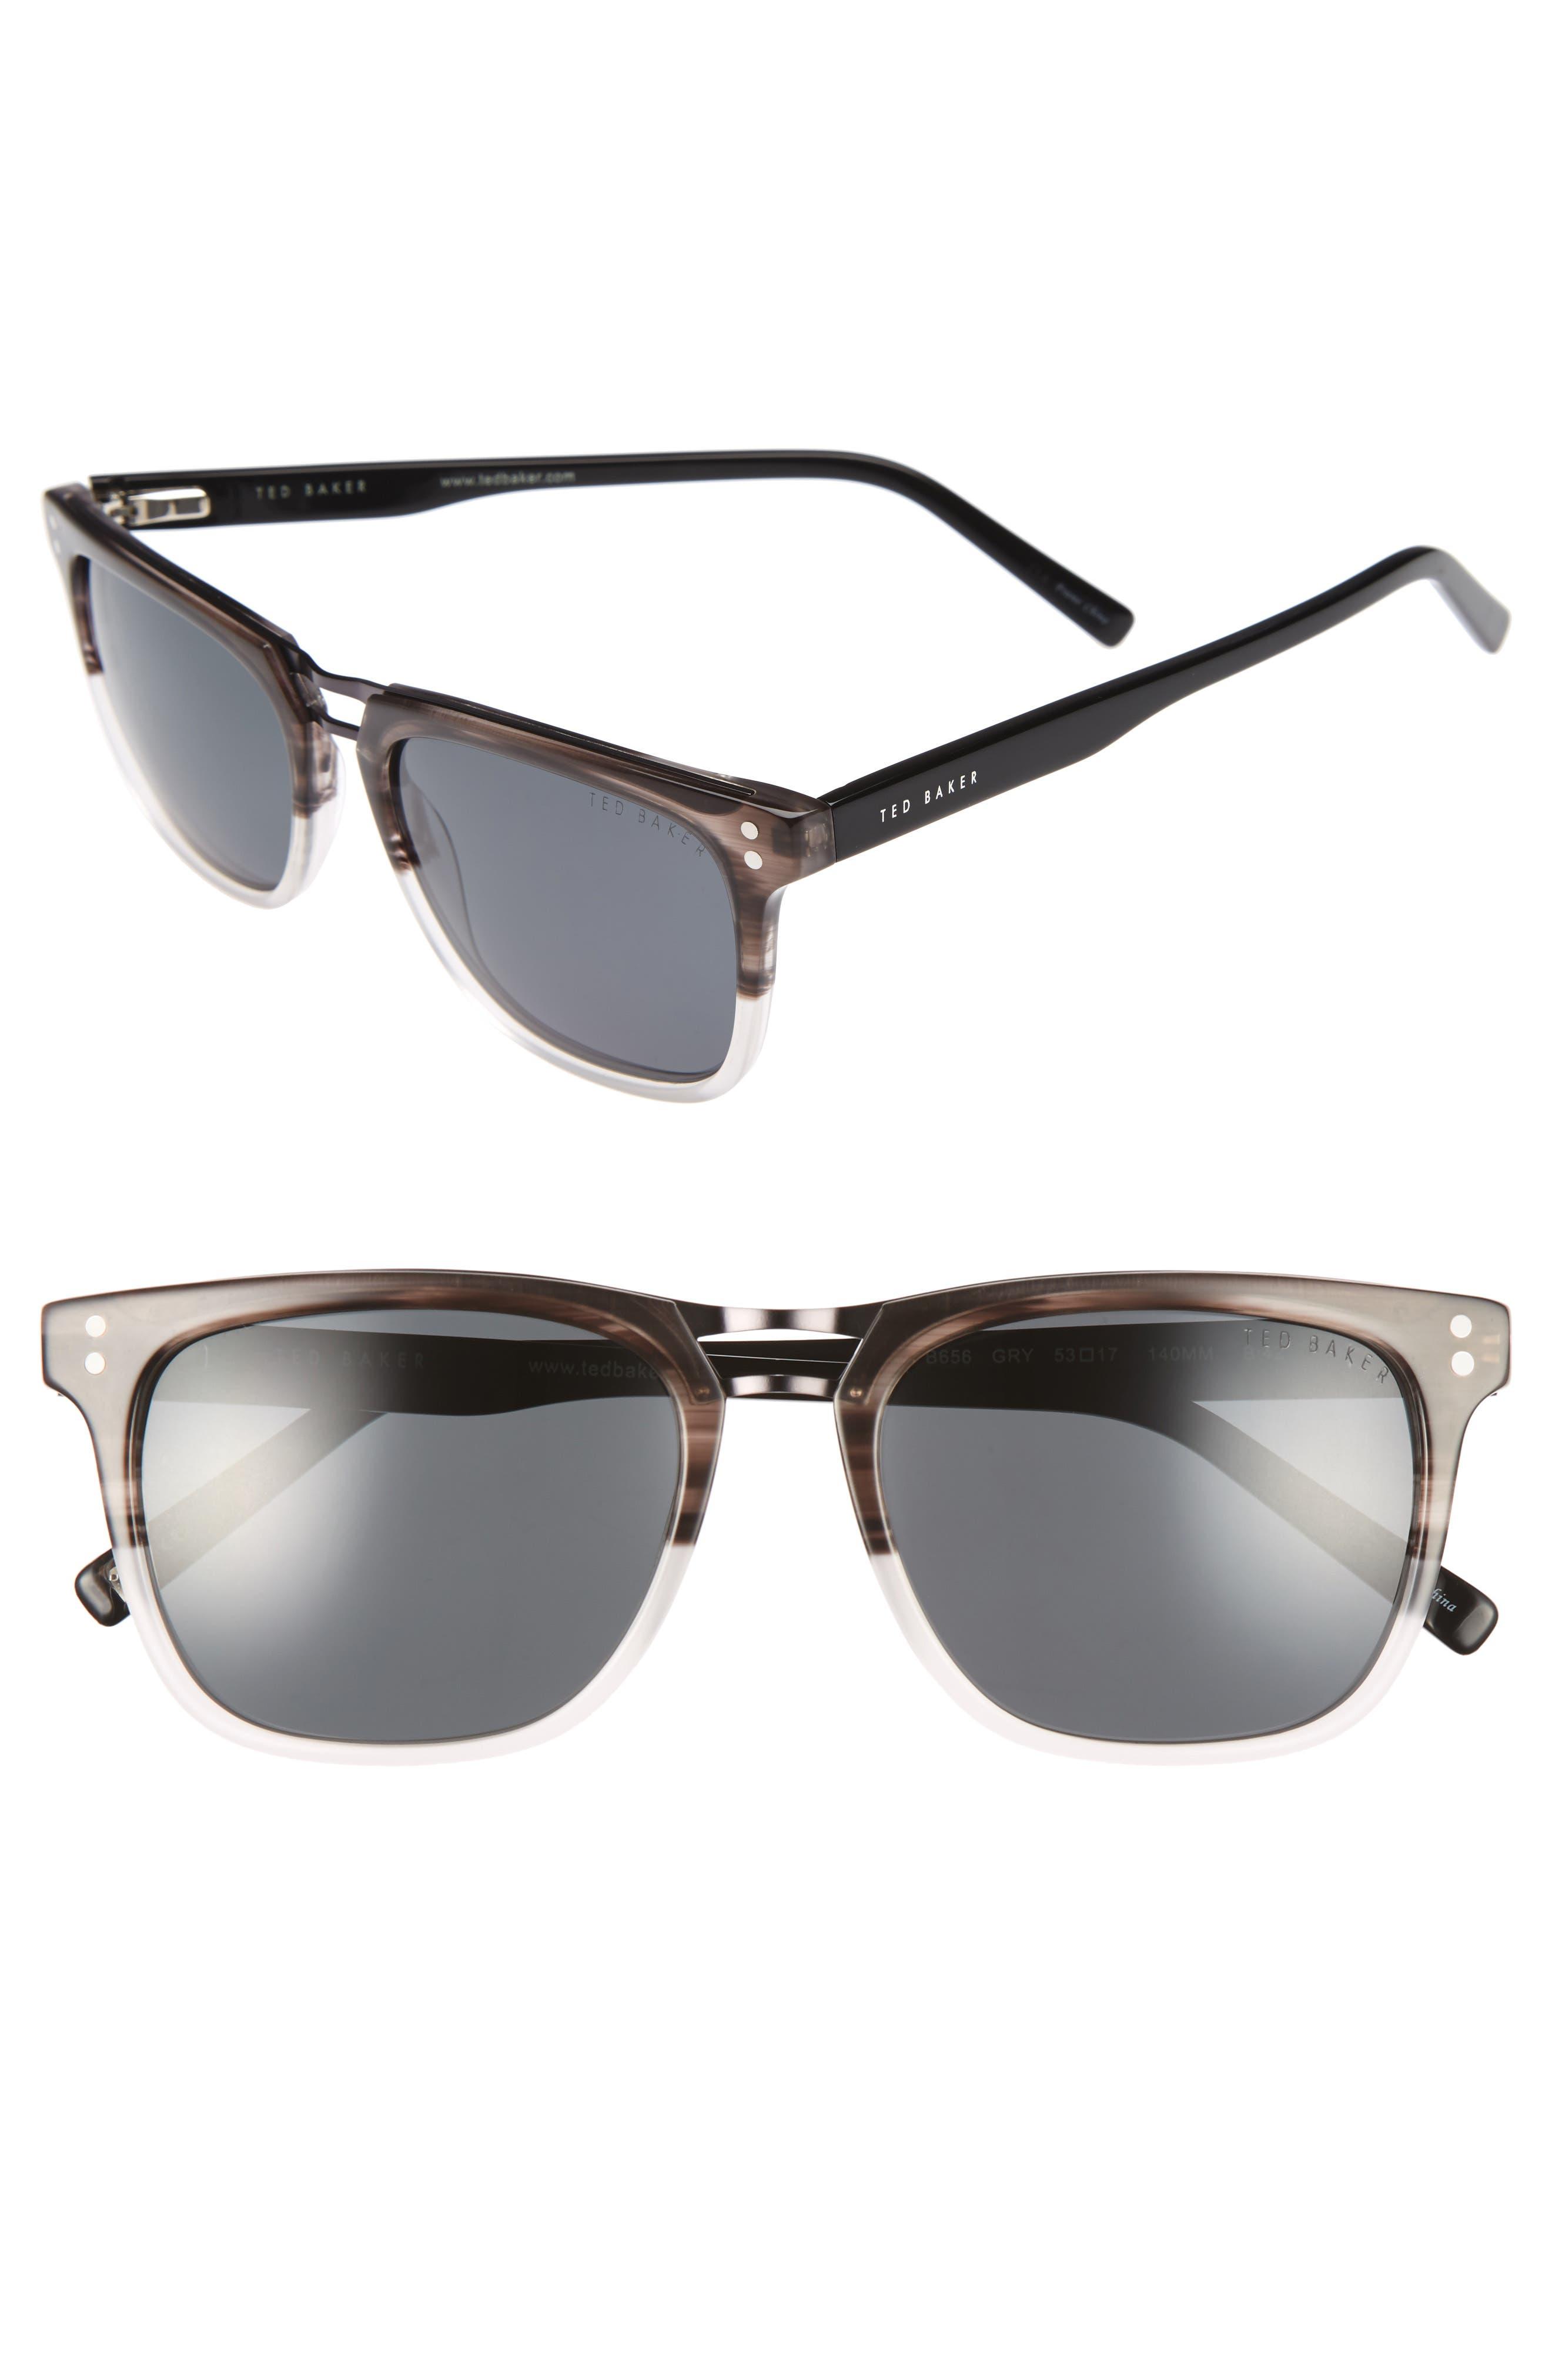 Main Image - Ted Baker London 53mm Polarized Sunglasses